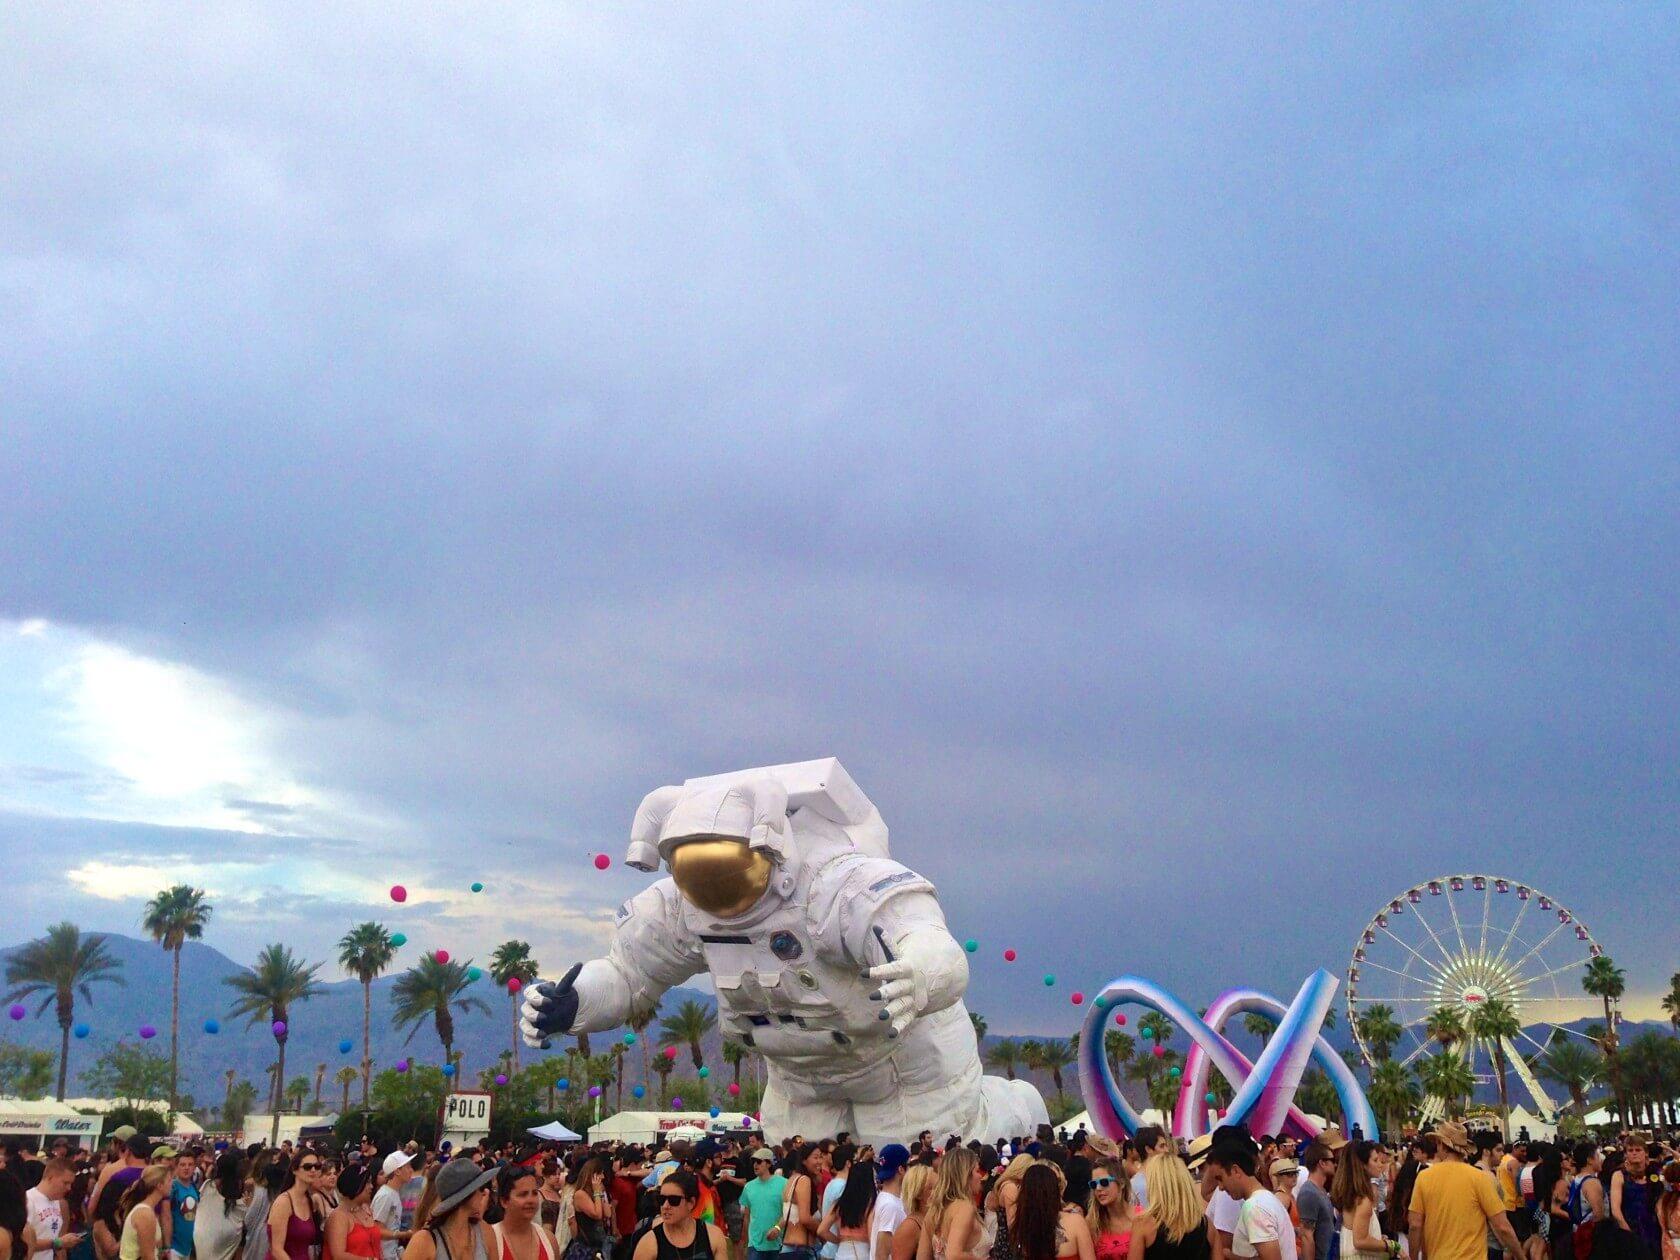 coachella music festival astronaut